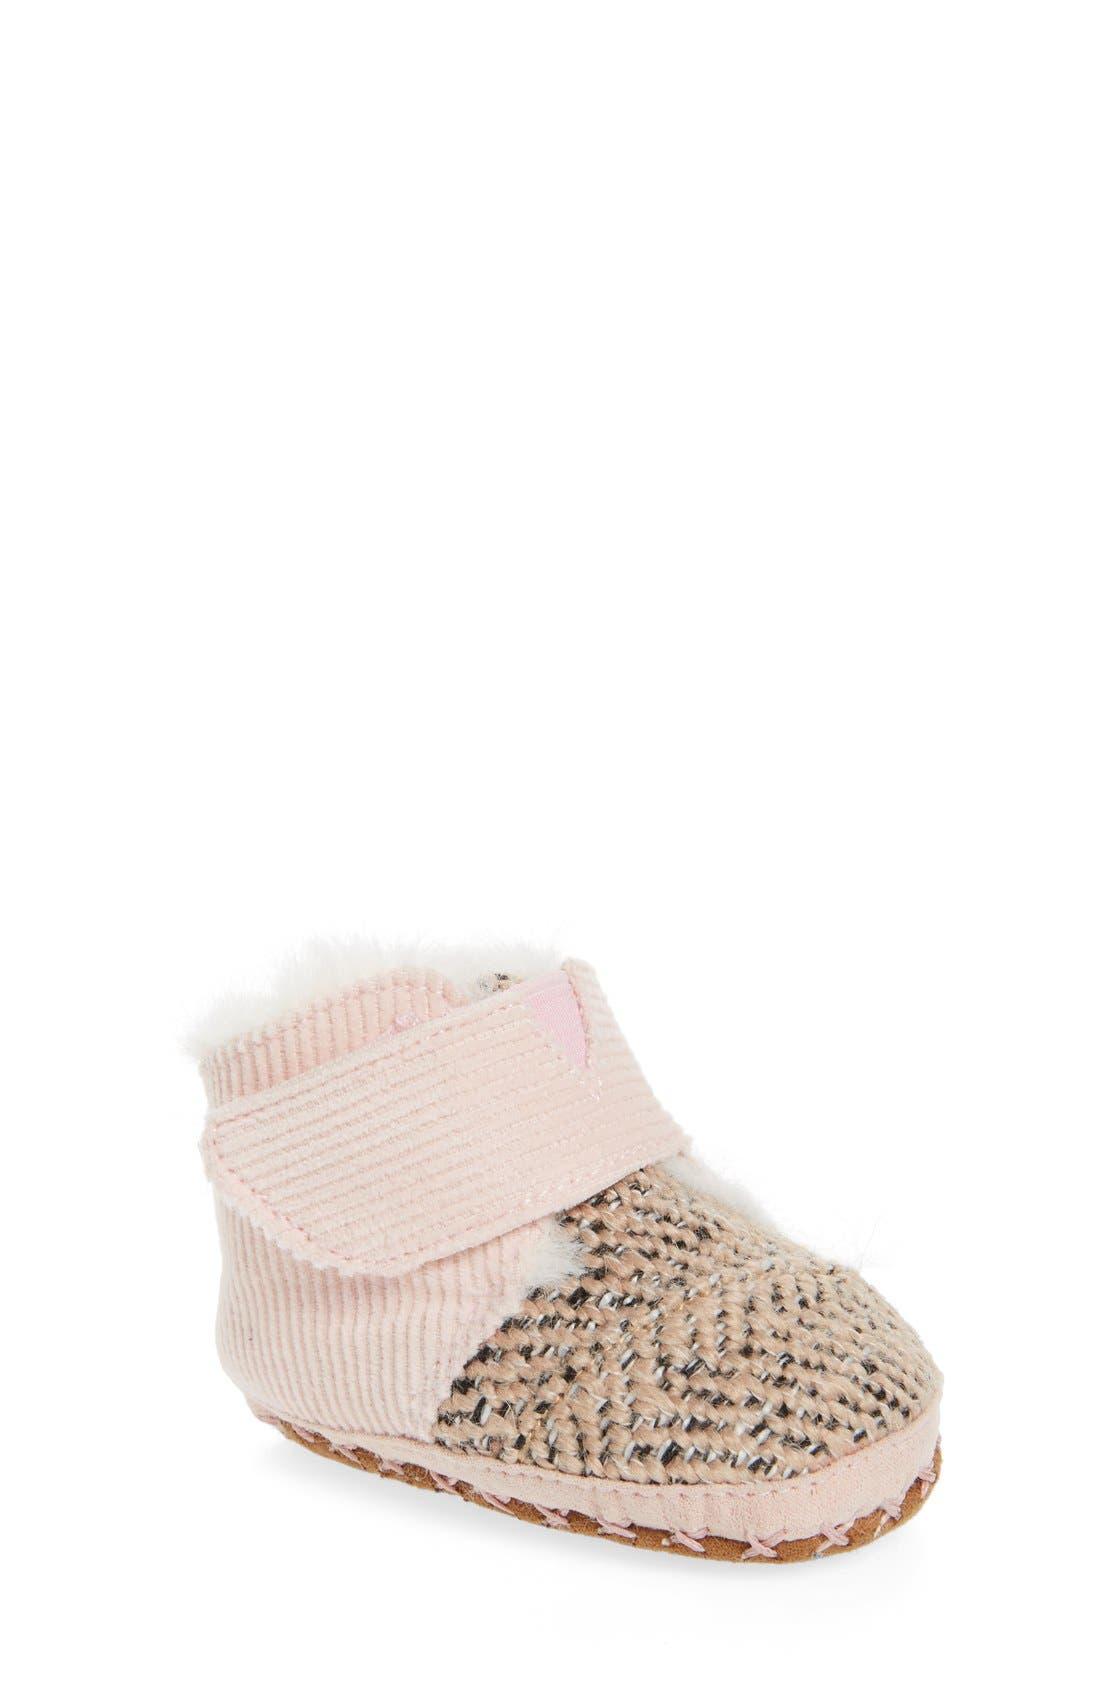 Cuna Crib Shoe,                             Main thumbnail 1, color,                             PINK